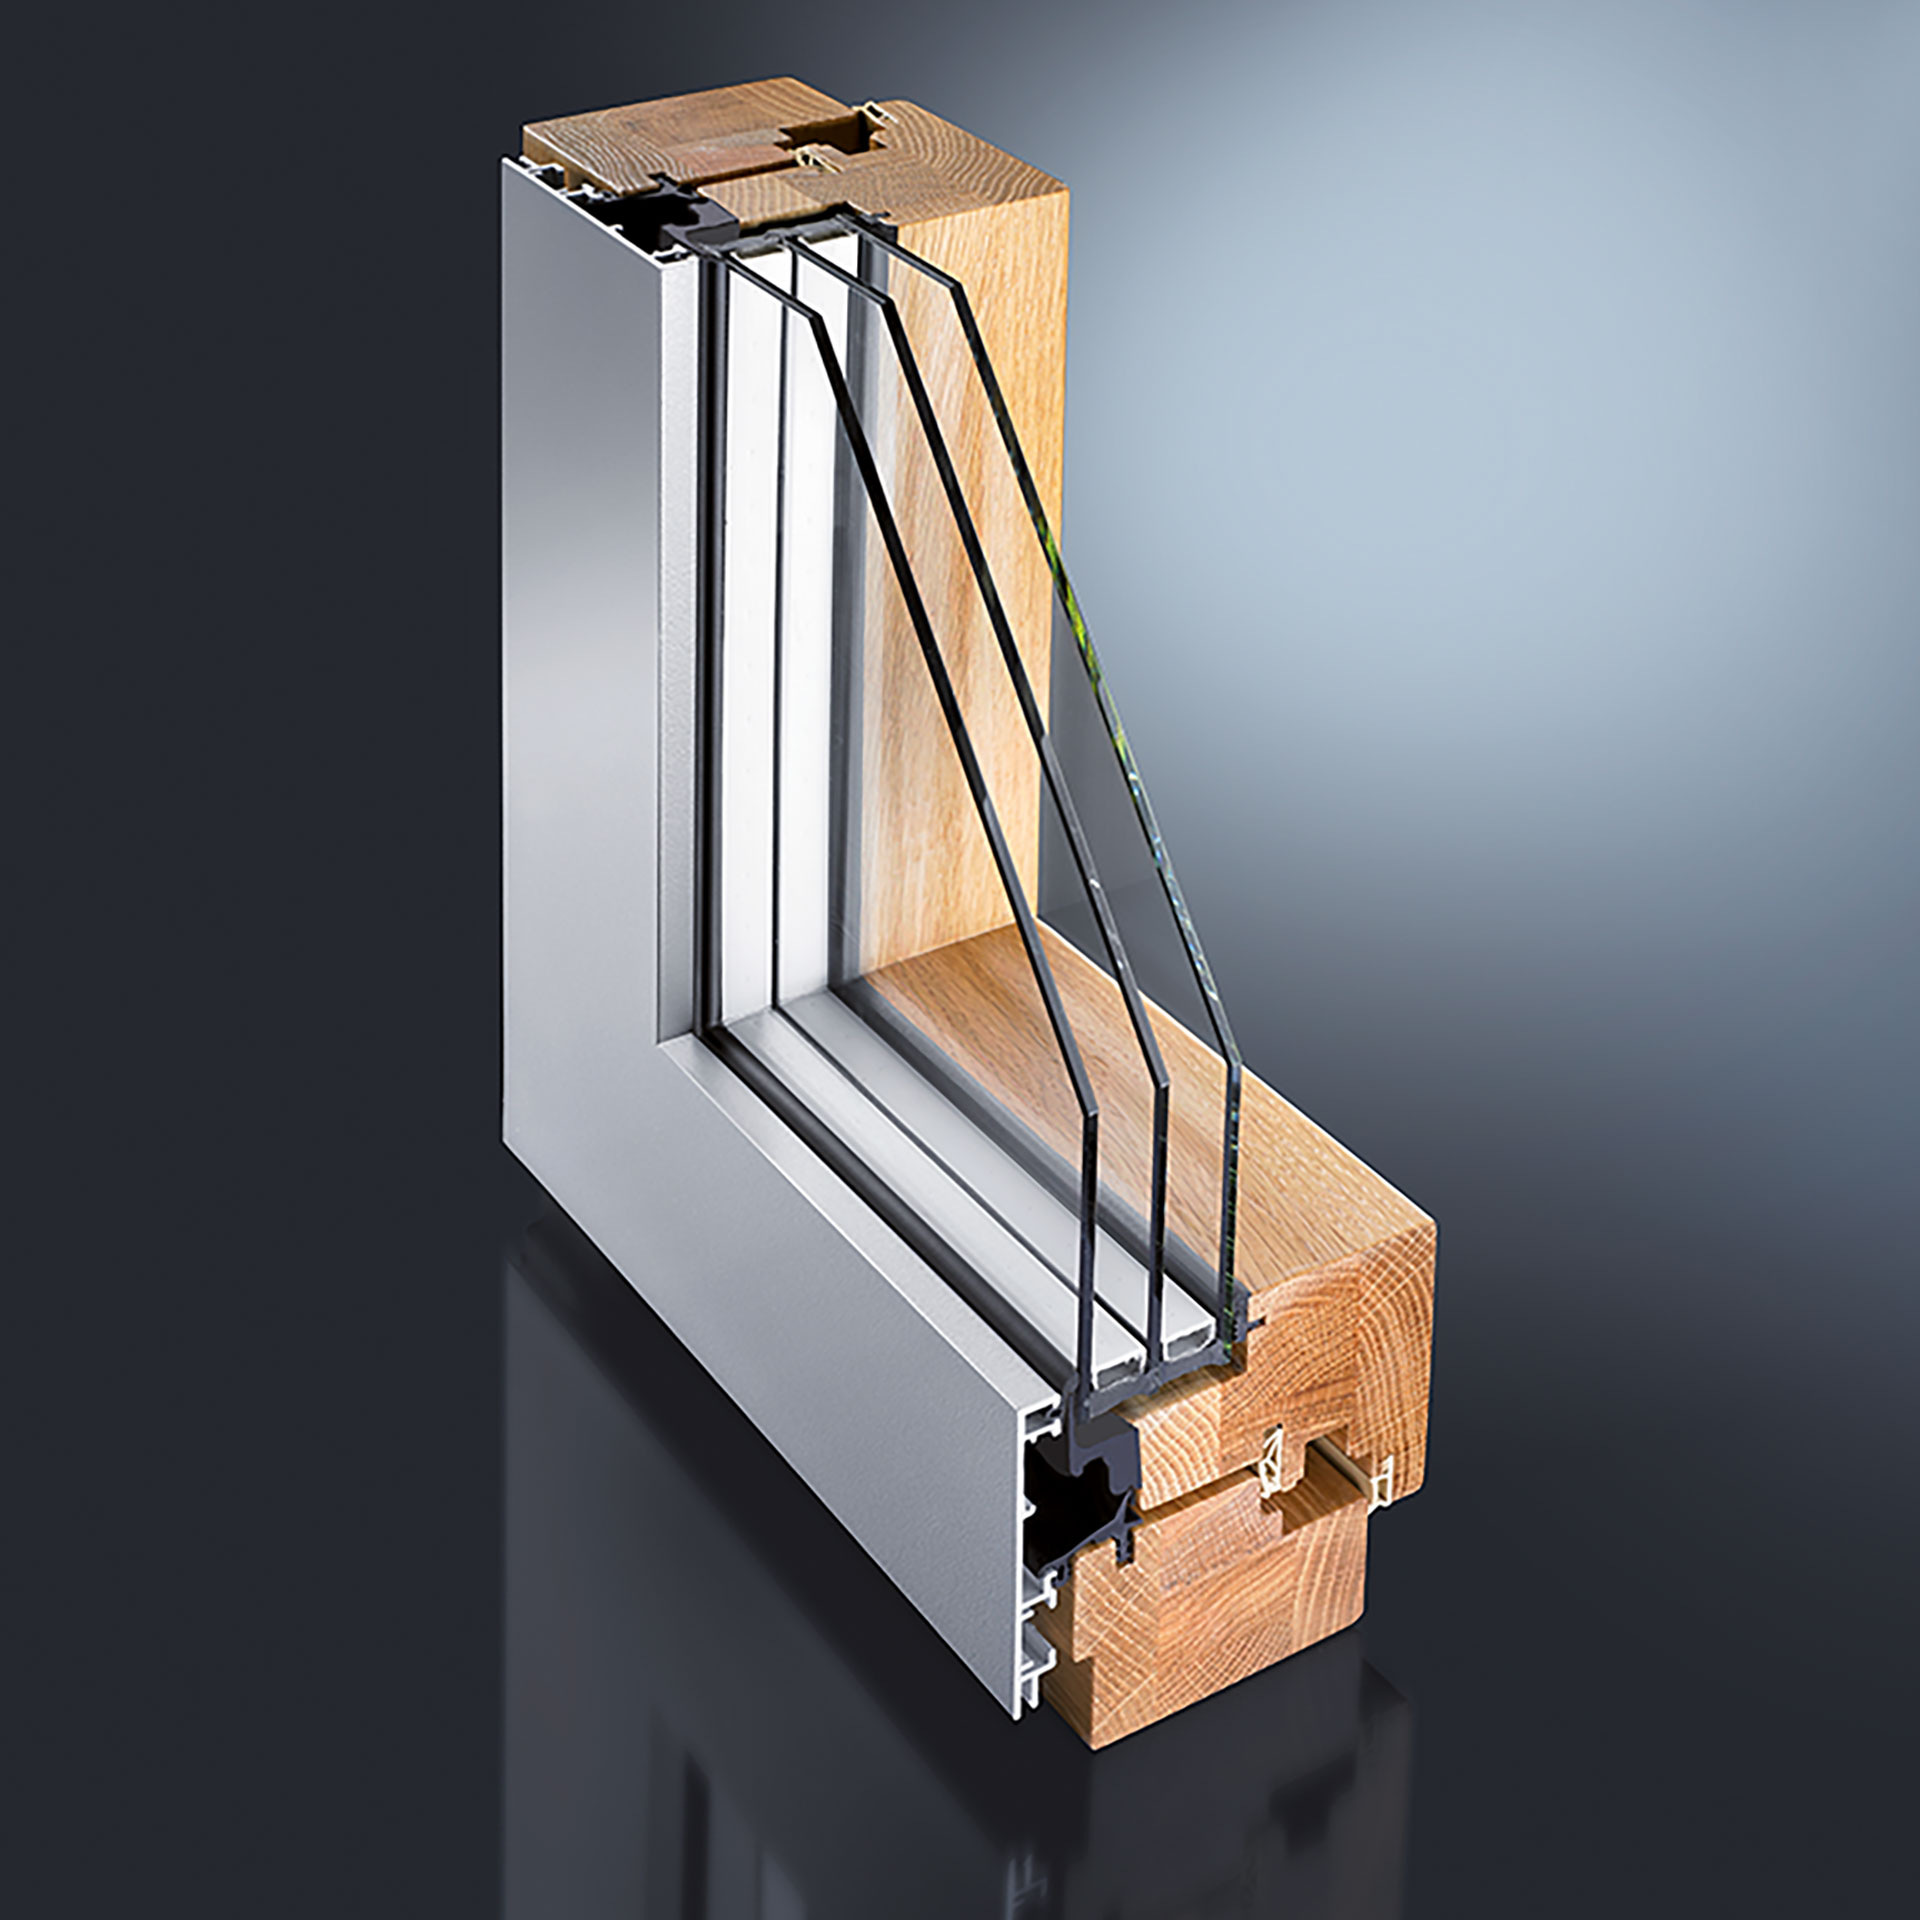 gutmann mira contour integral holz aluminium fenster t r system. Black Bedroom Furniture Sets. Home Design Ideas